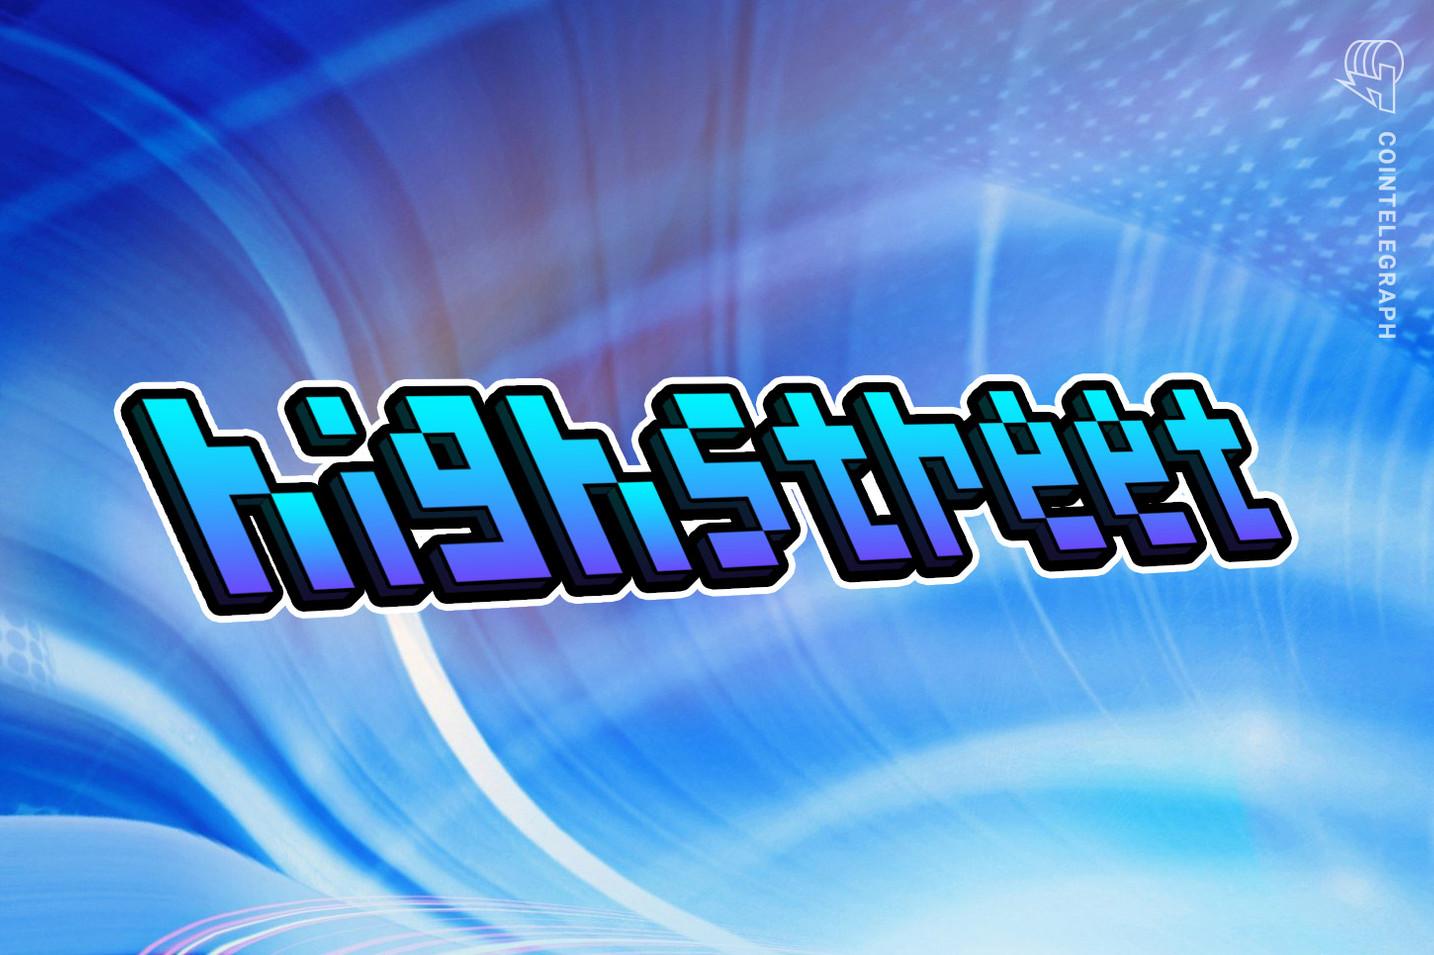 Highstreet raises strategic round led by Binance and Animoca Brands